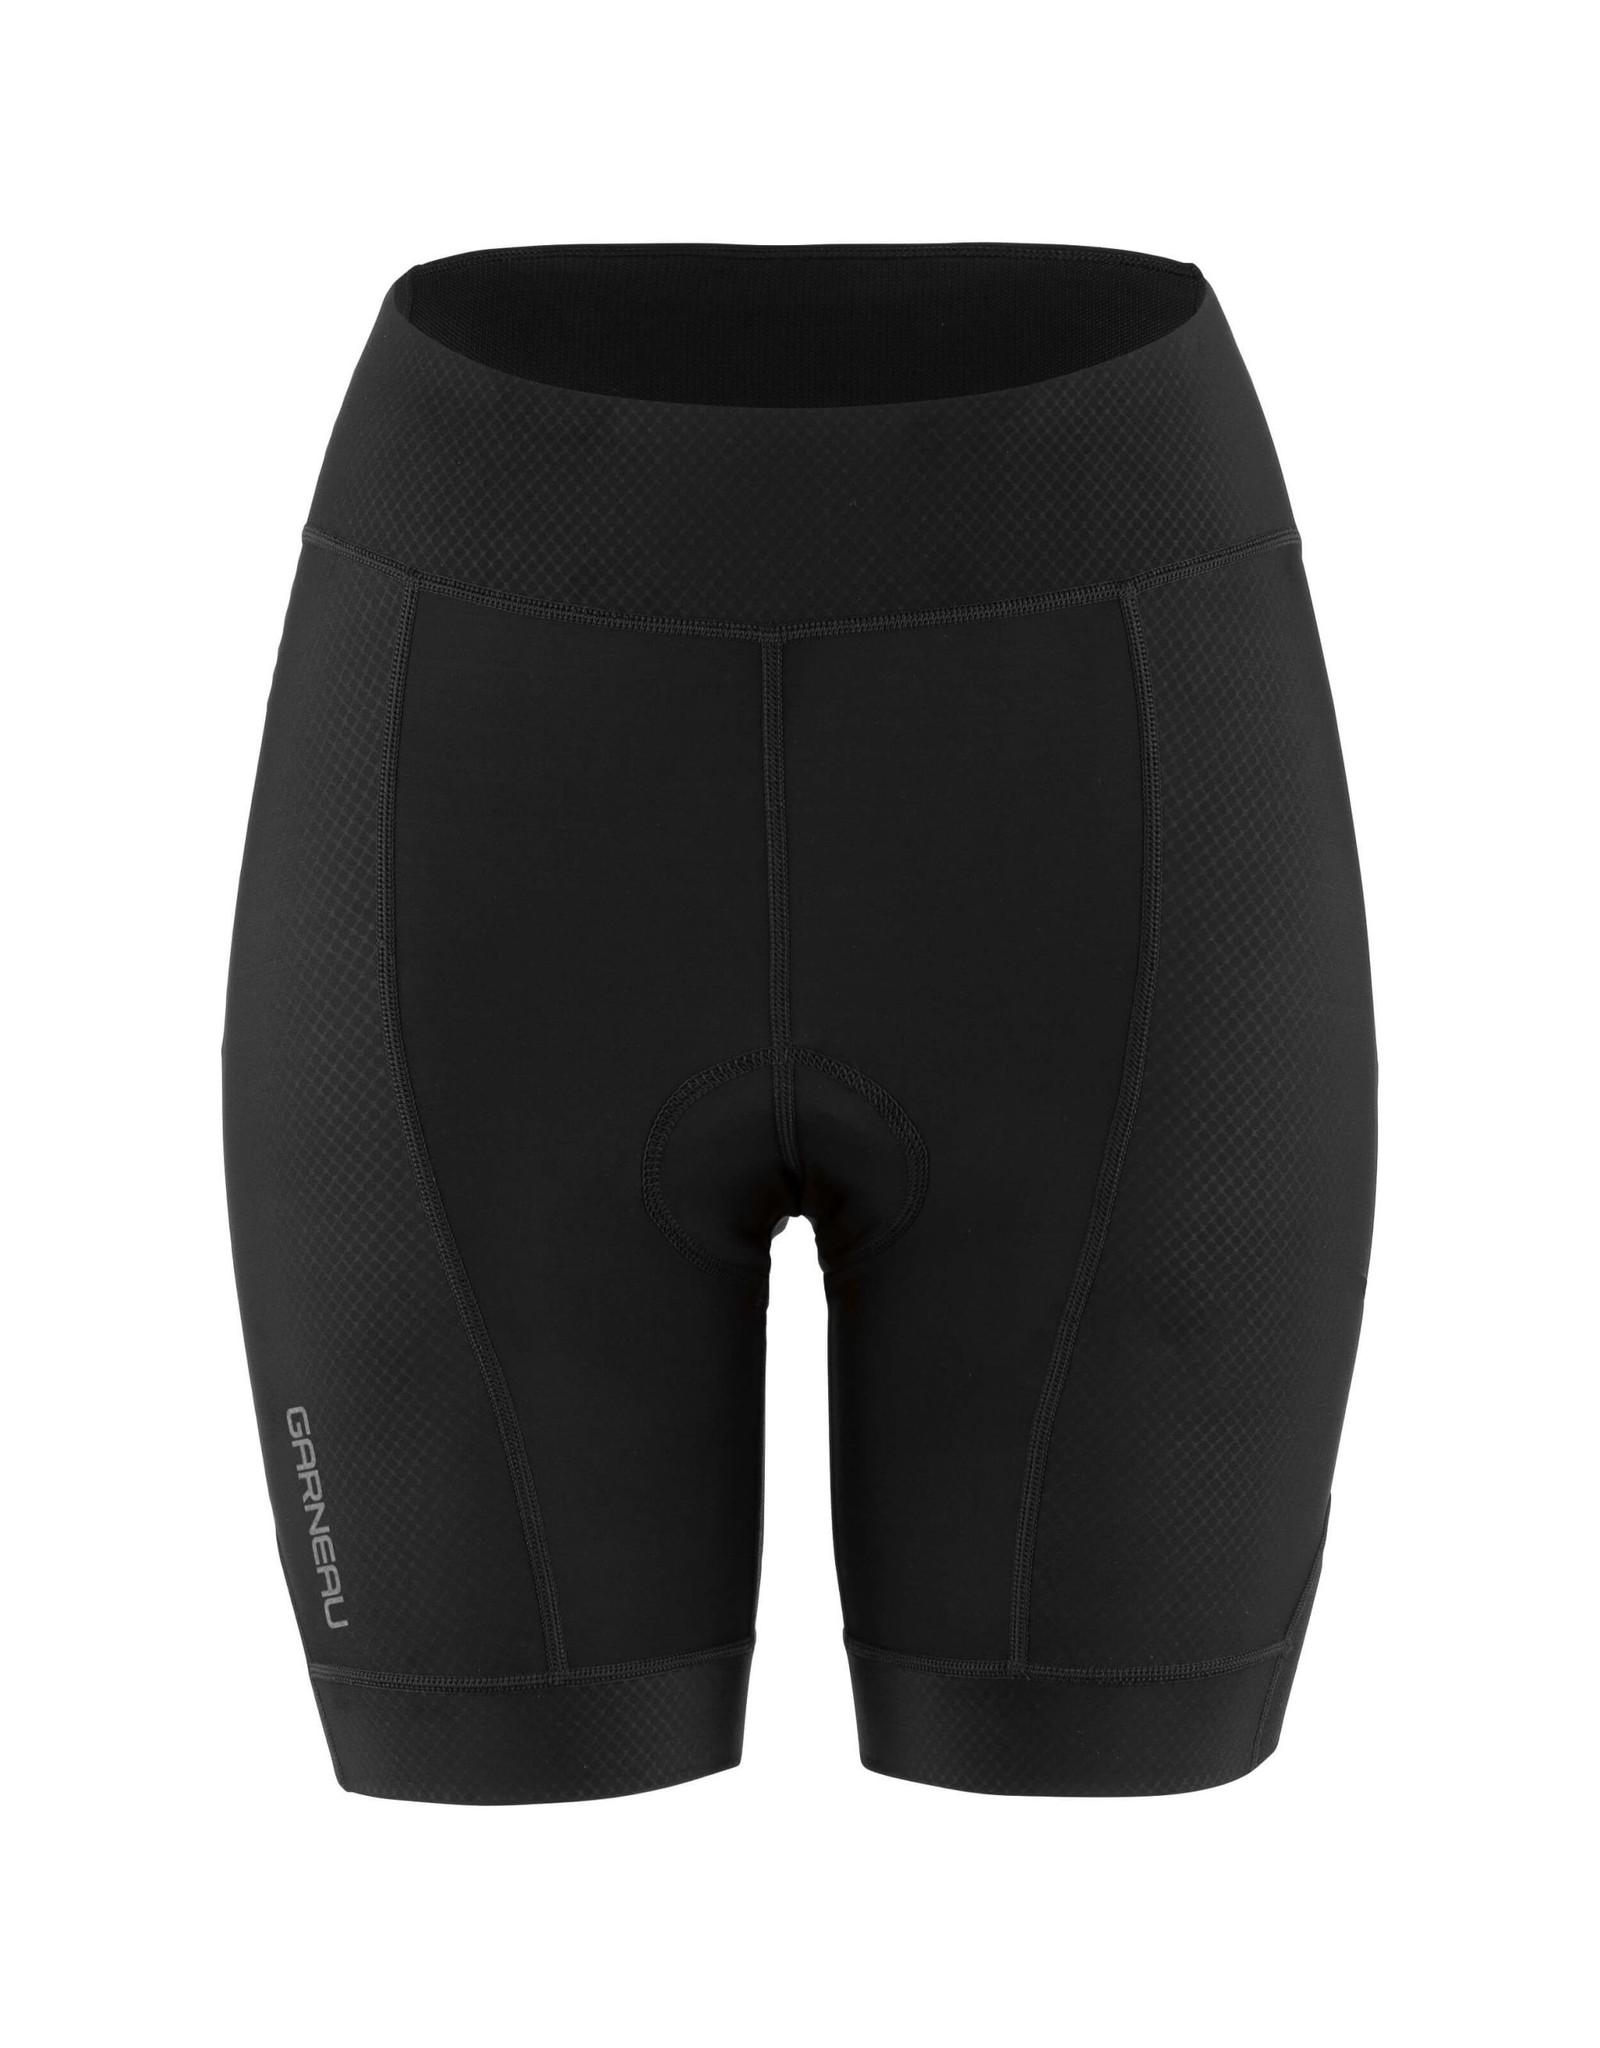 Garneau Shorts Garneau Optimum 2 wom